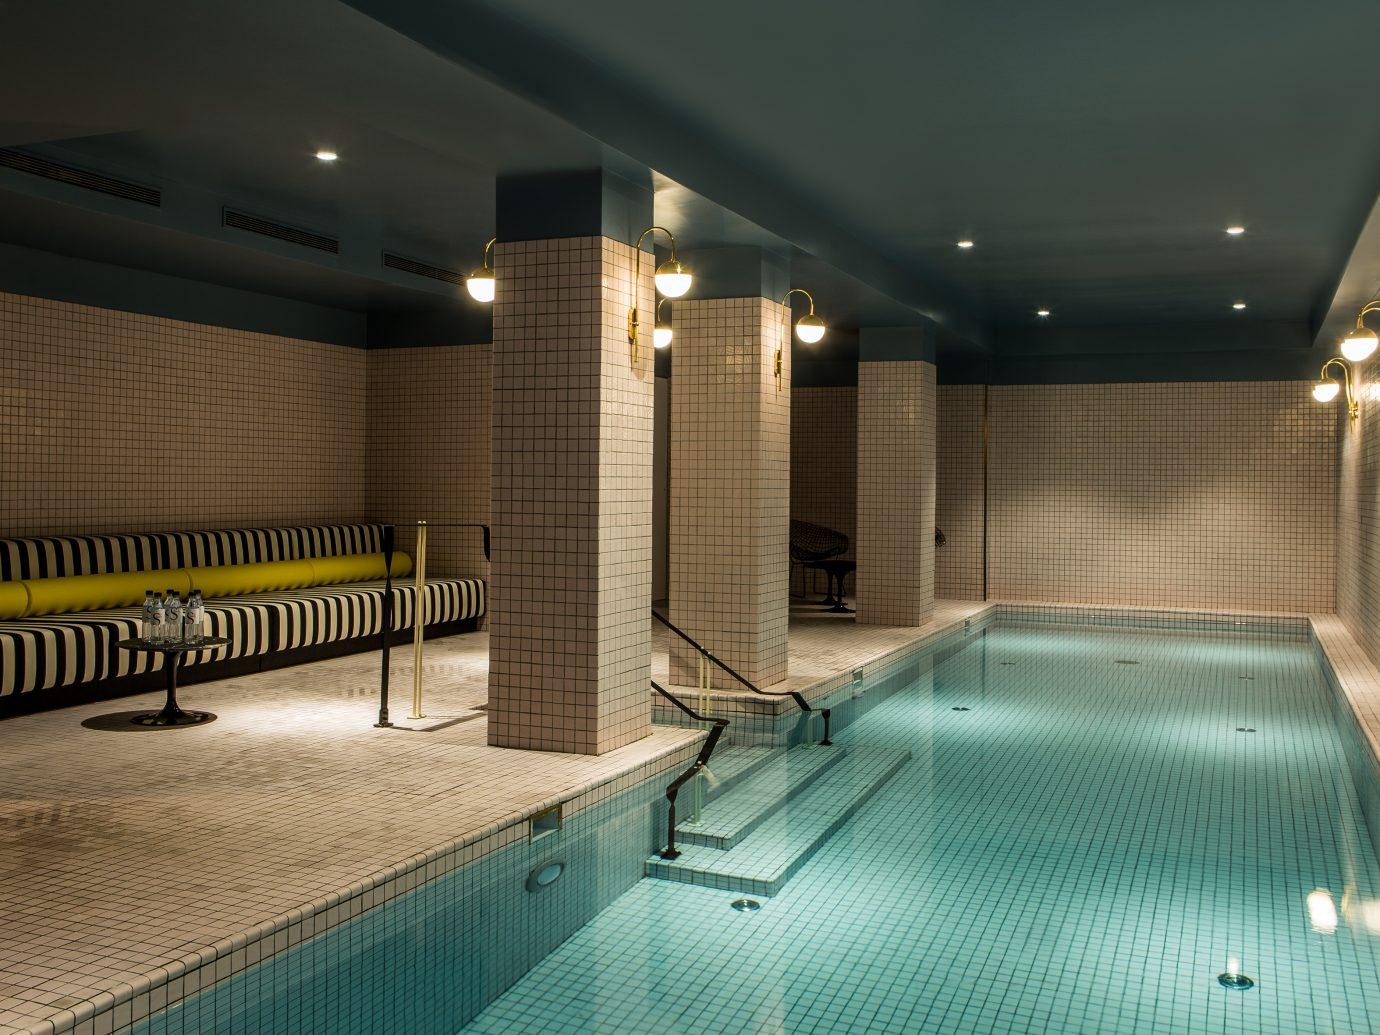 indoor pool at L'Hôtel du Rond Point des Champs Elysées